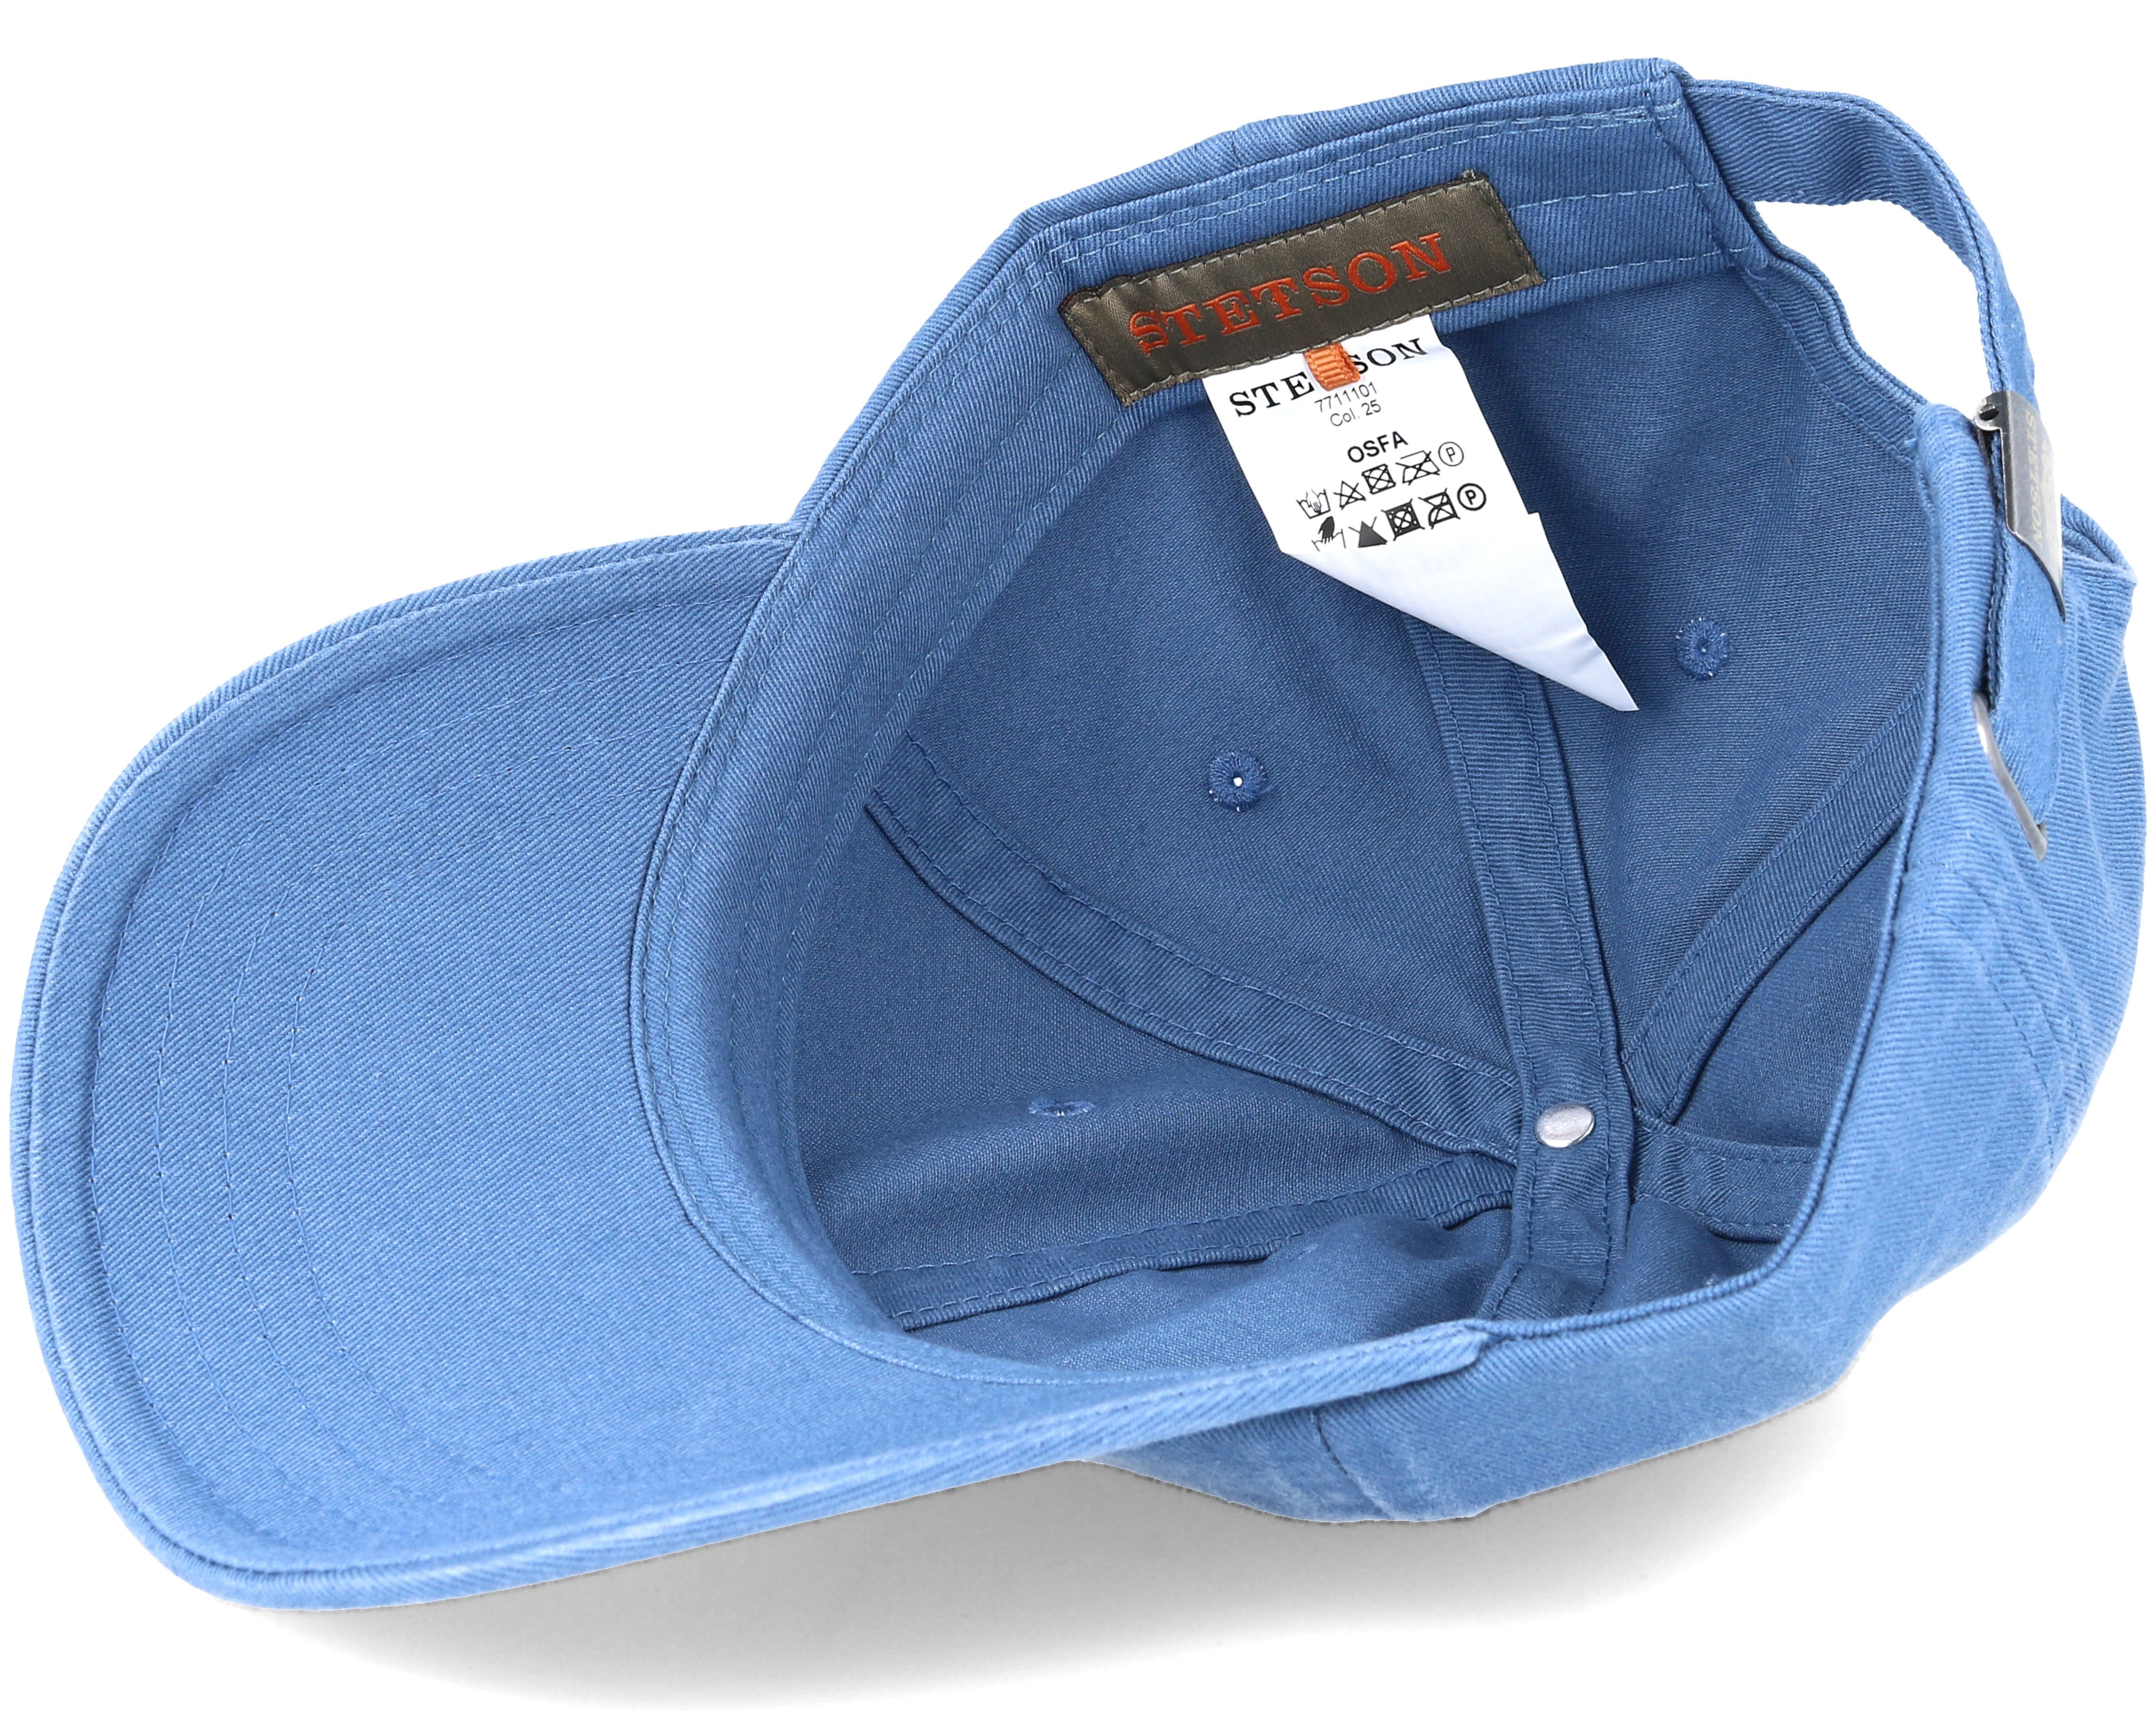 Baseball Cotton Light Blue Adjustable Stetson Caps